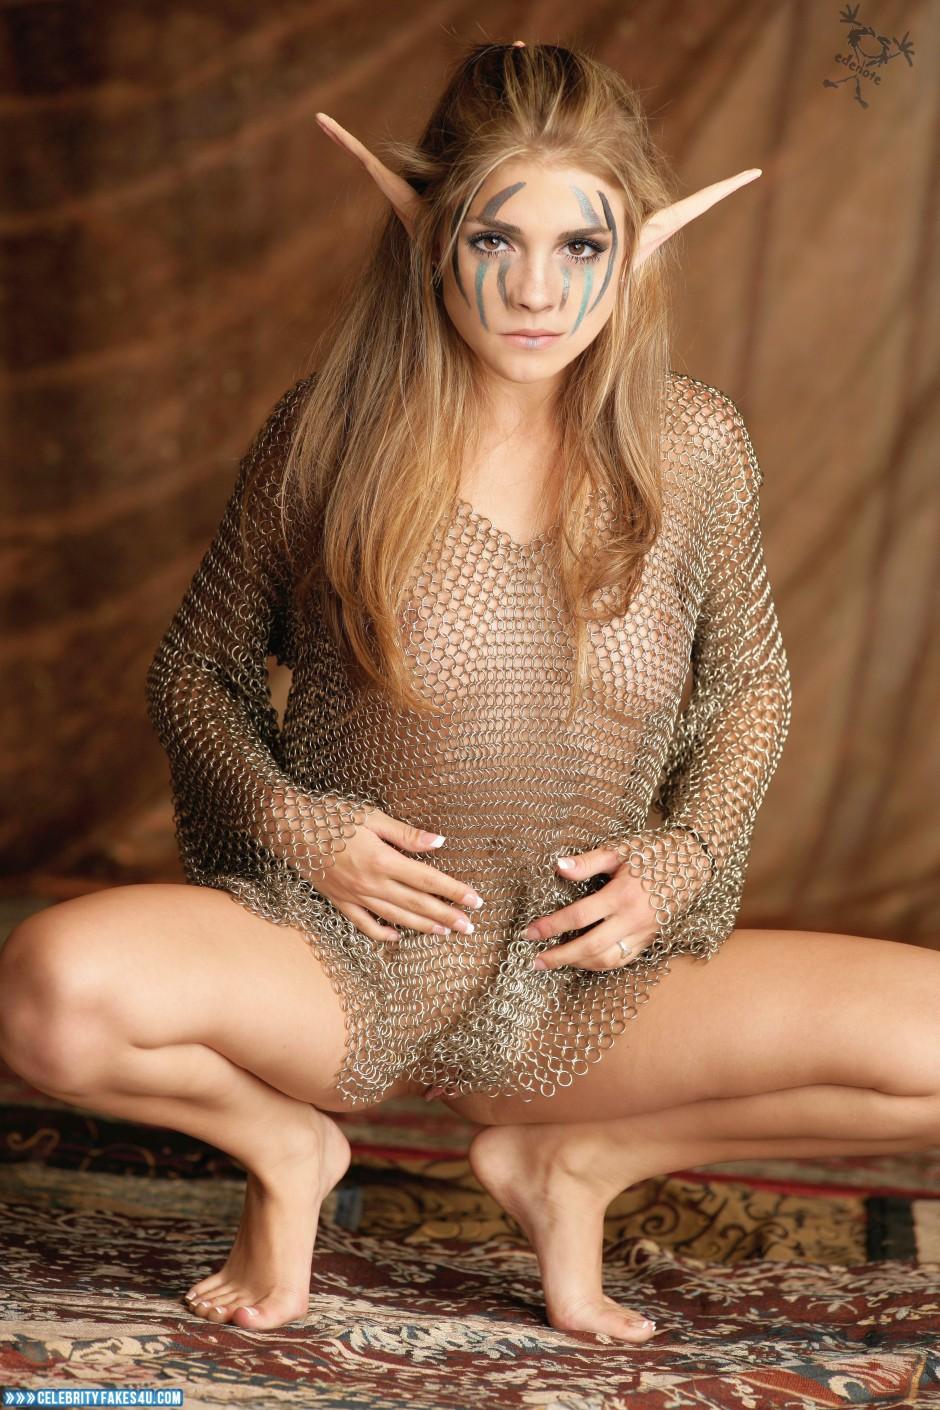 Emma Watson Fake, Legs Spread, Nude, Pussy, Tits, Porn